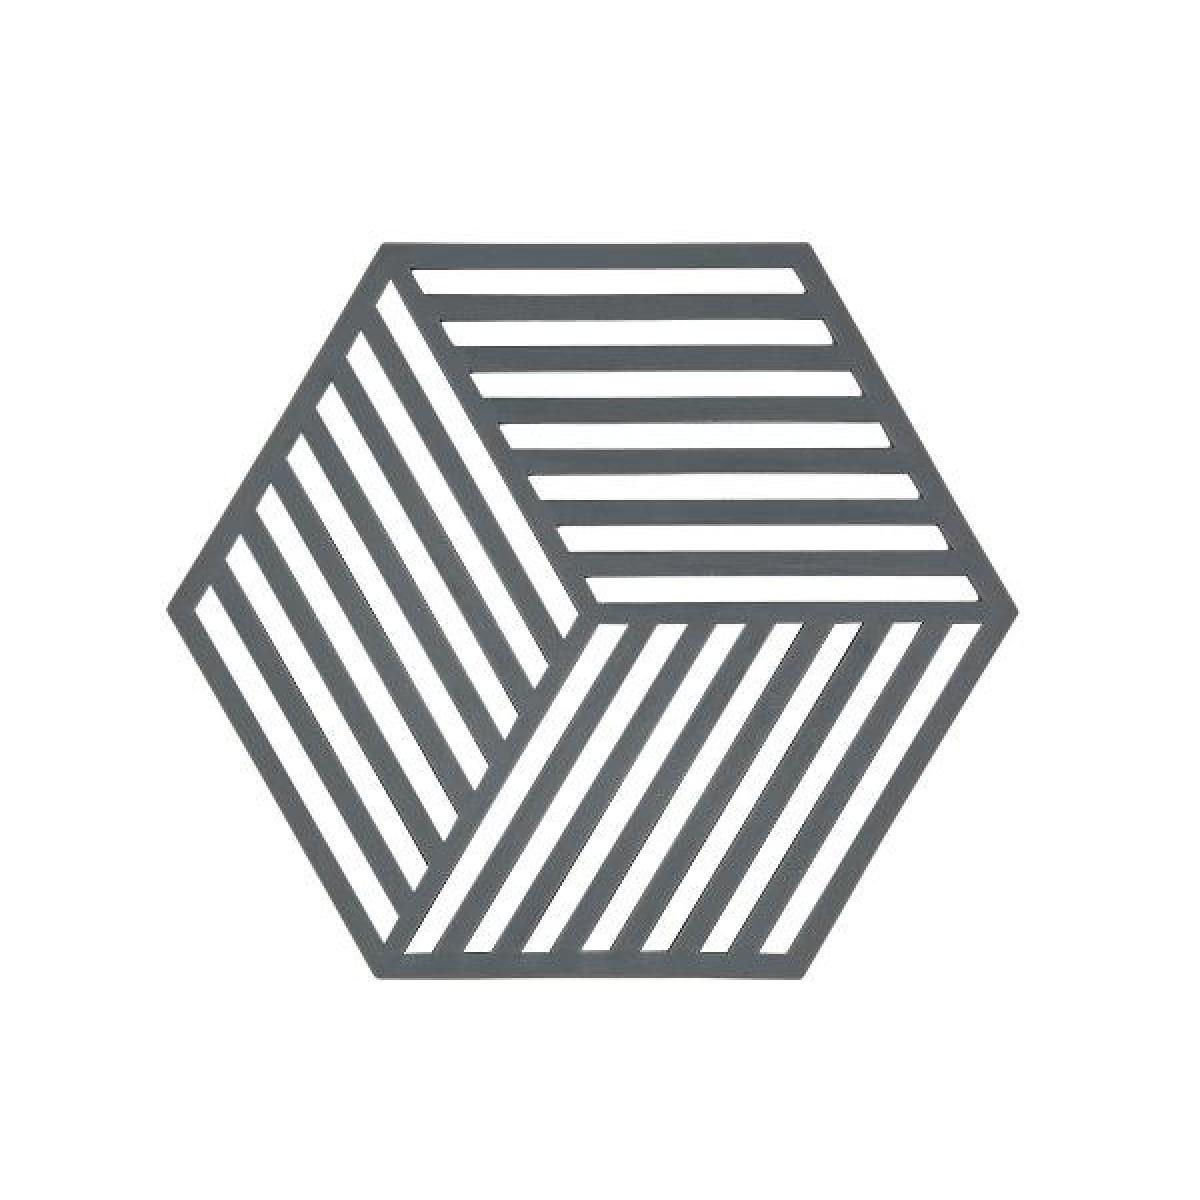 ZONE Hexagon bordskåner cool grey